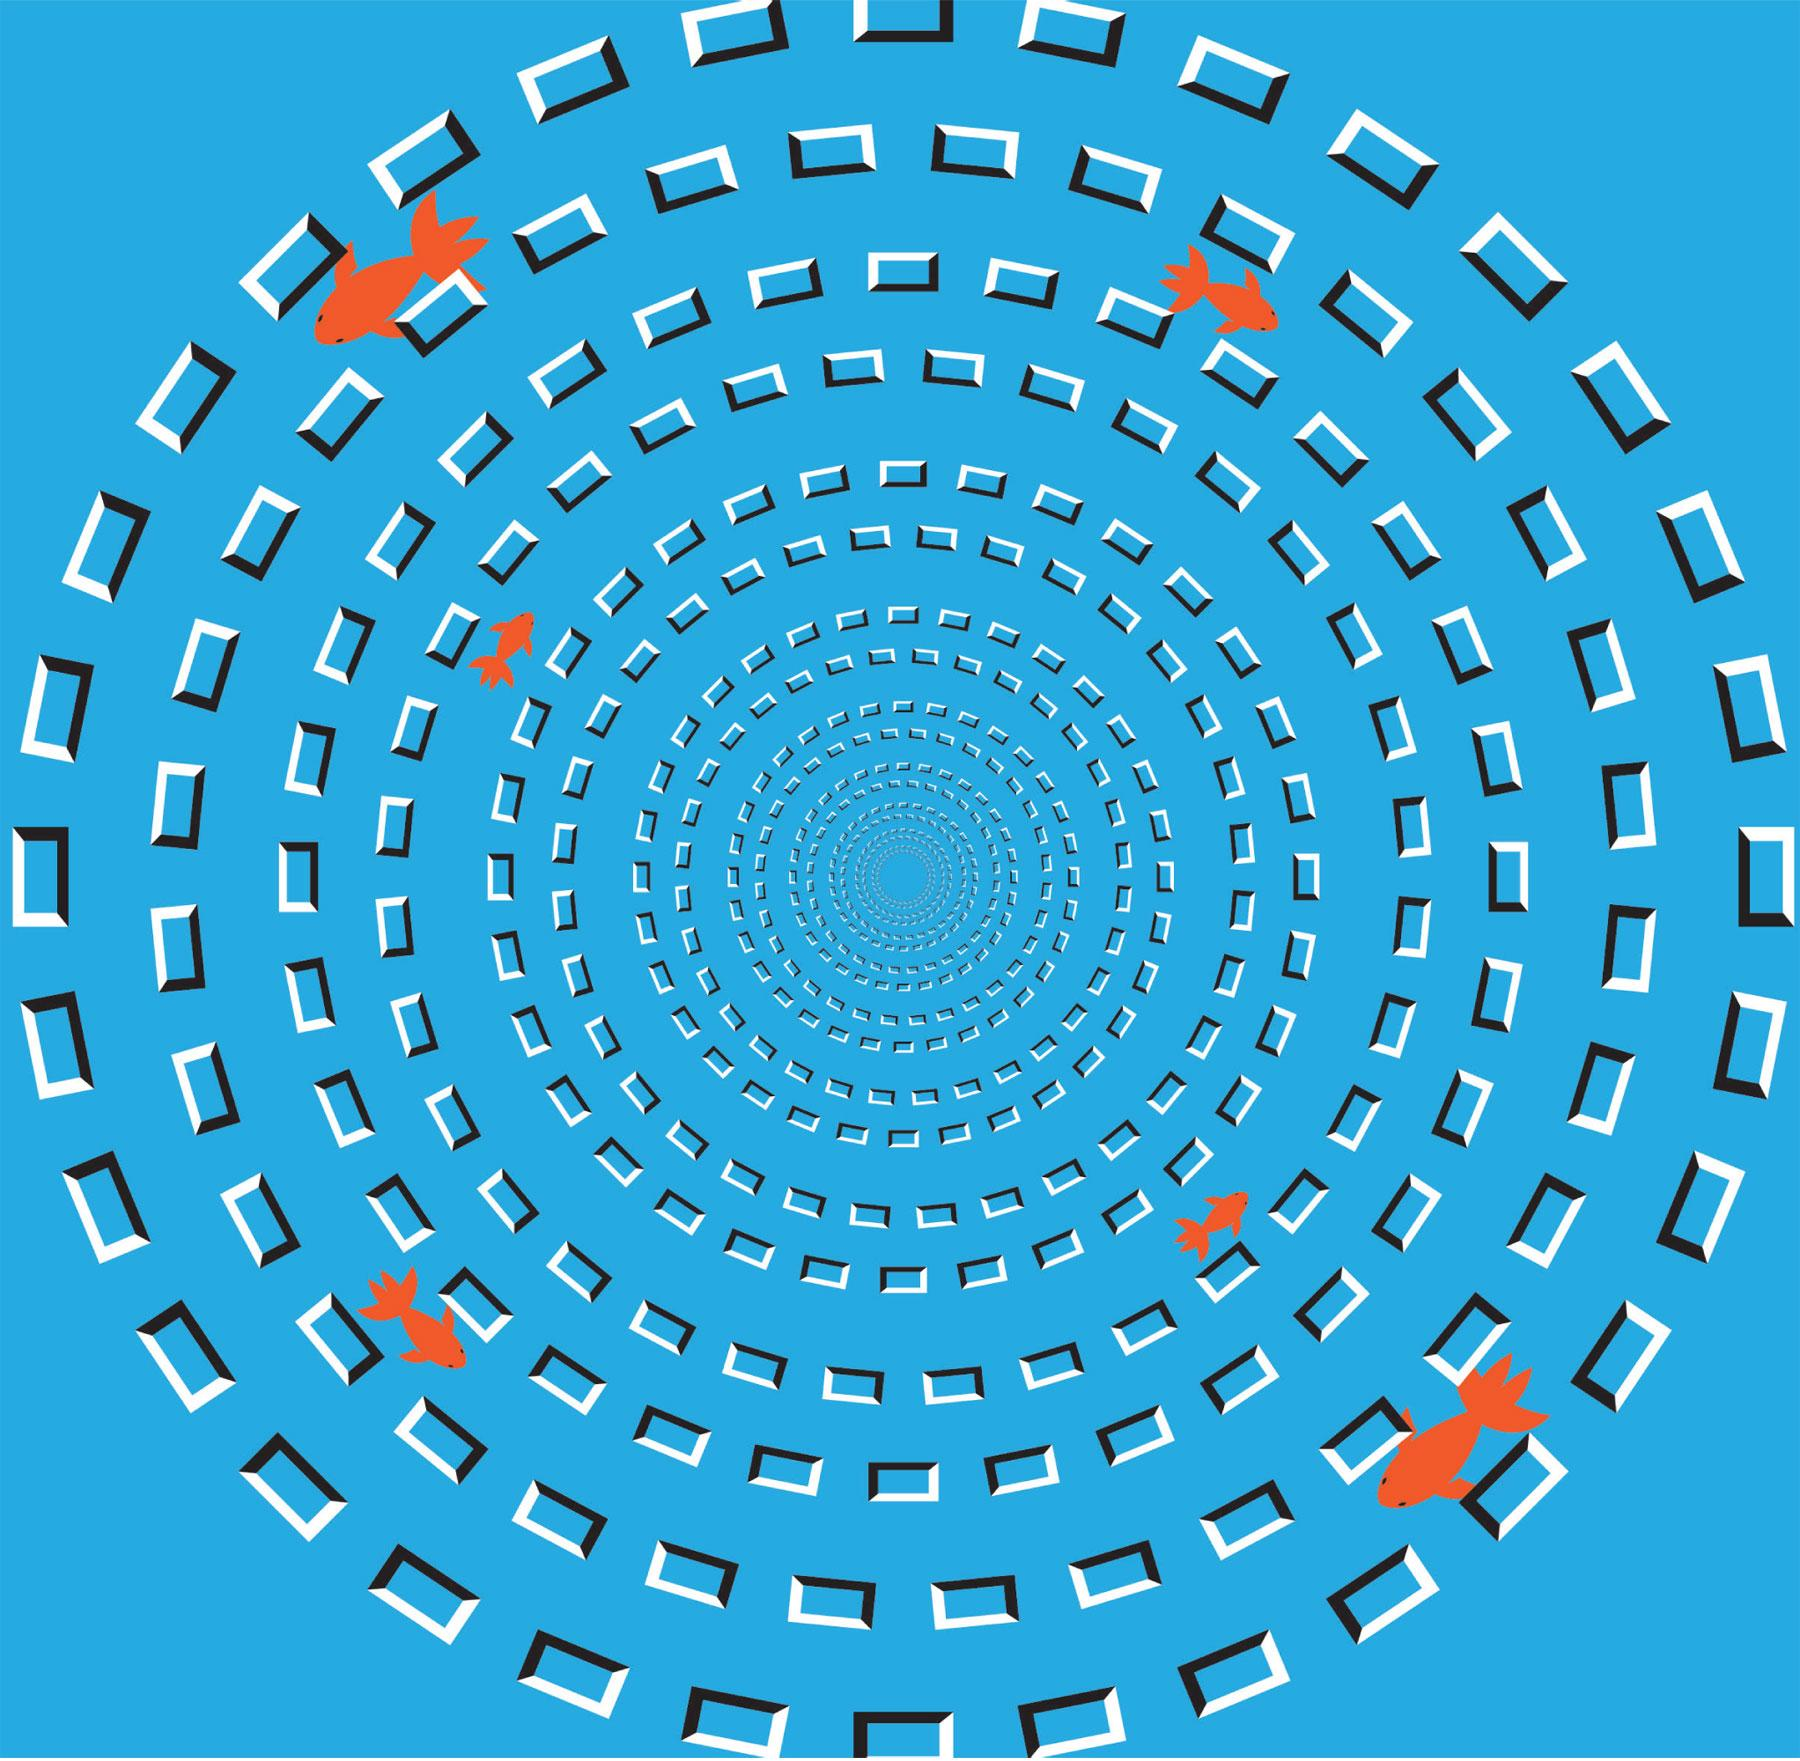 2ac2a359180db 正月ボケを吹き飛ばす! 脳を活性化する衝撃「だまし絵」7連発 - Ameba ...